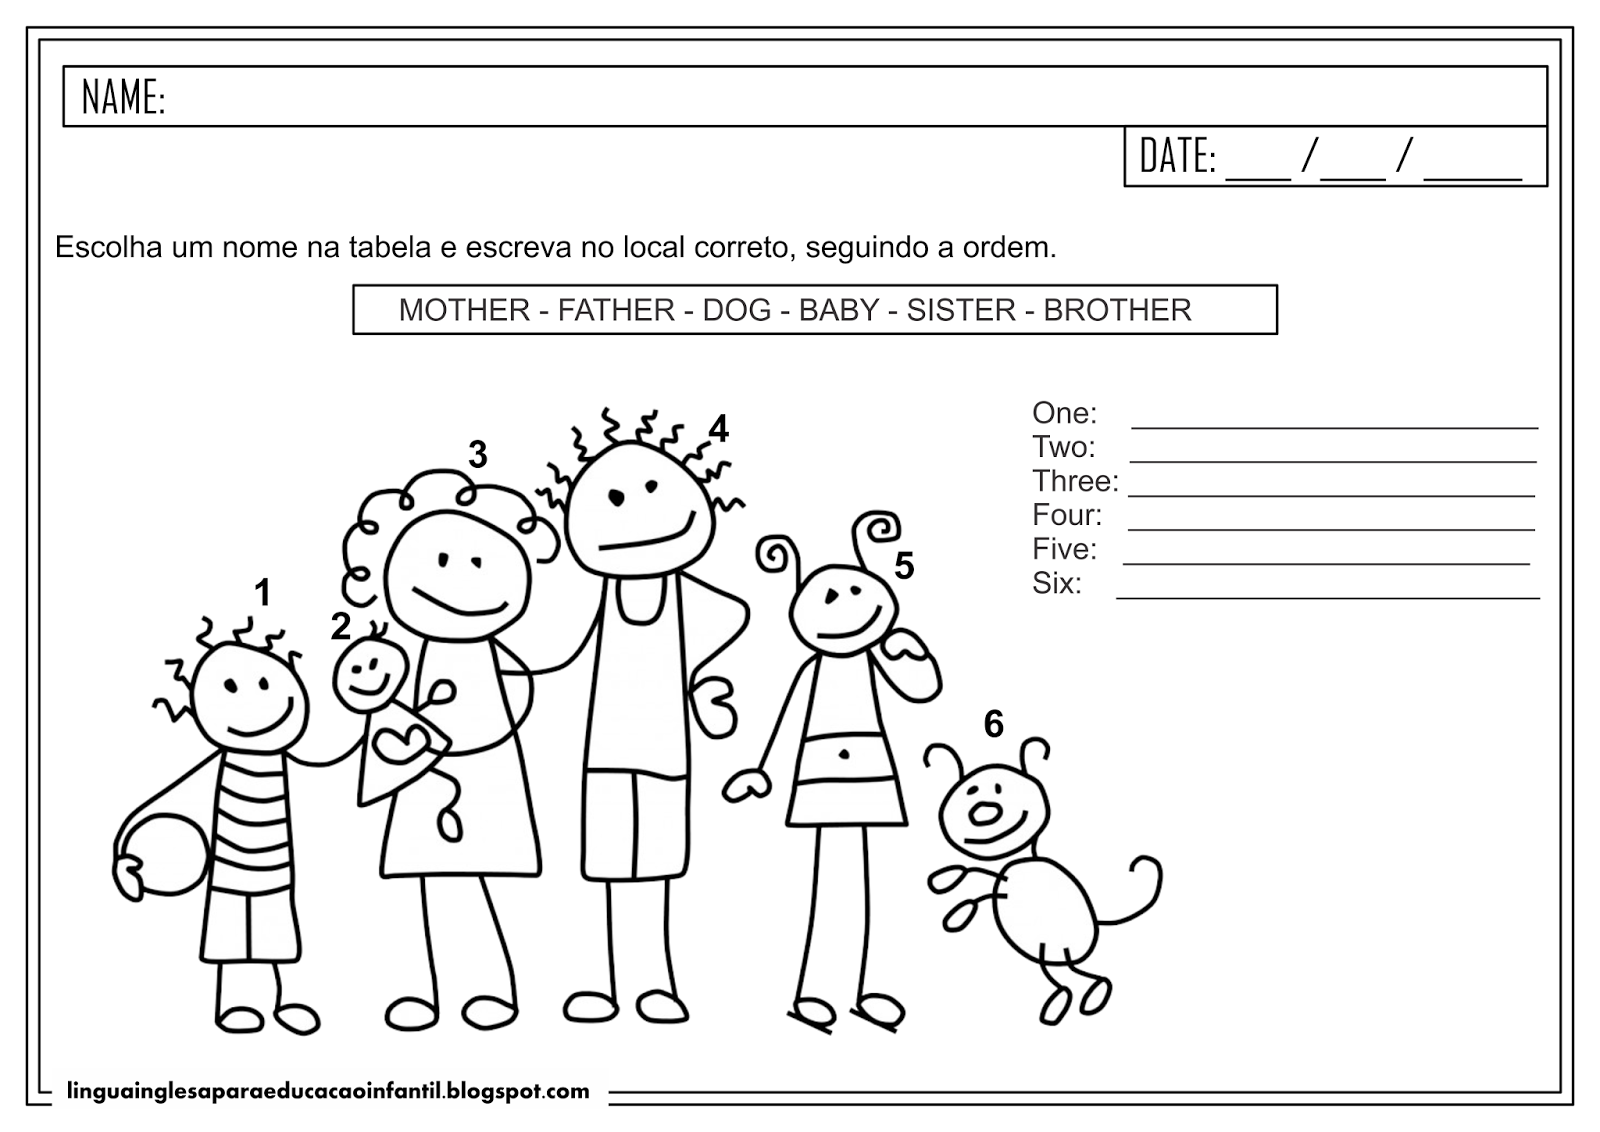 Lingua Inglesa Para Educacao Infantil Atividade De Ingles